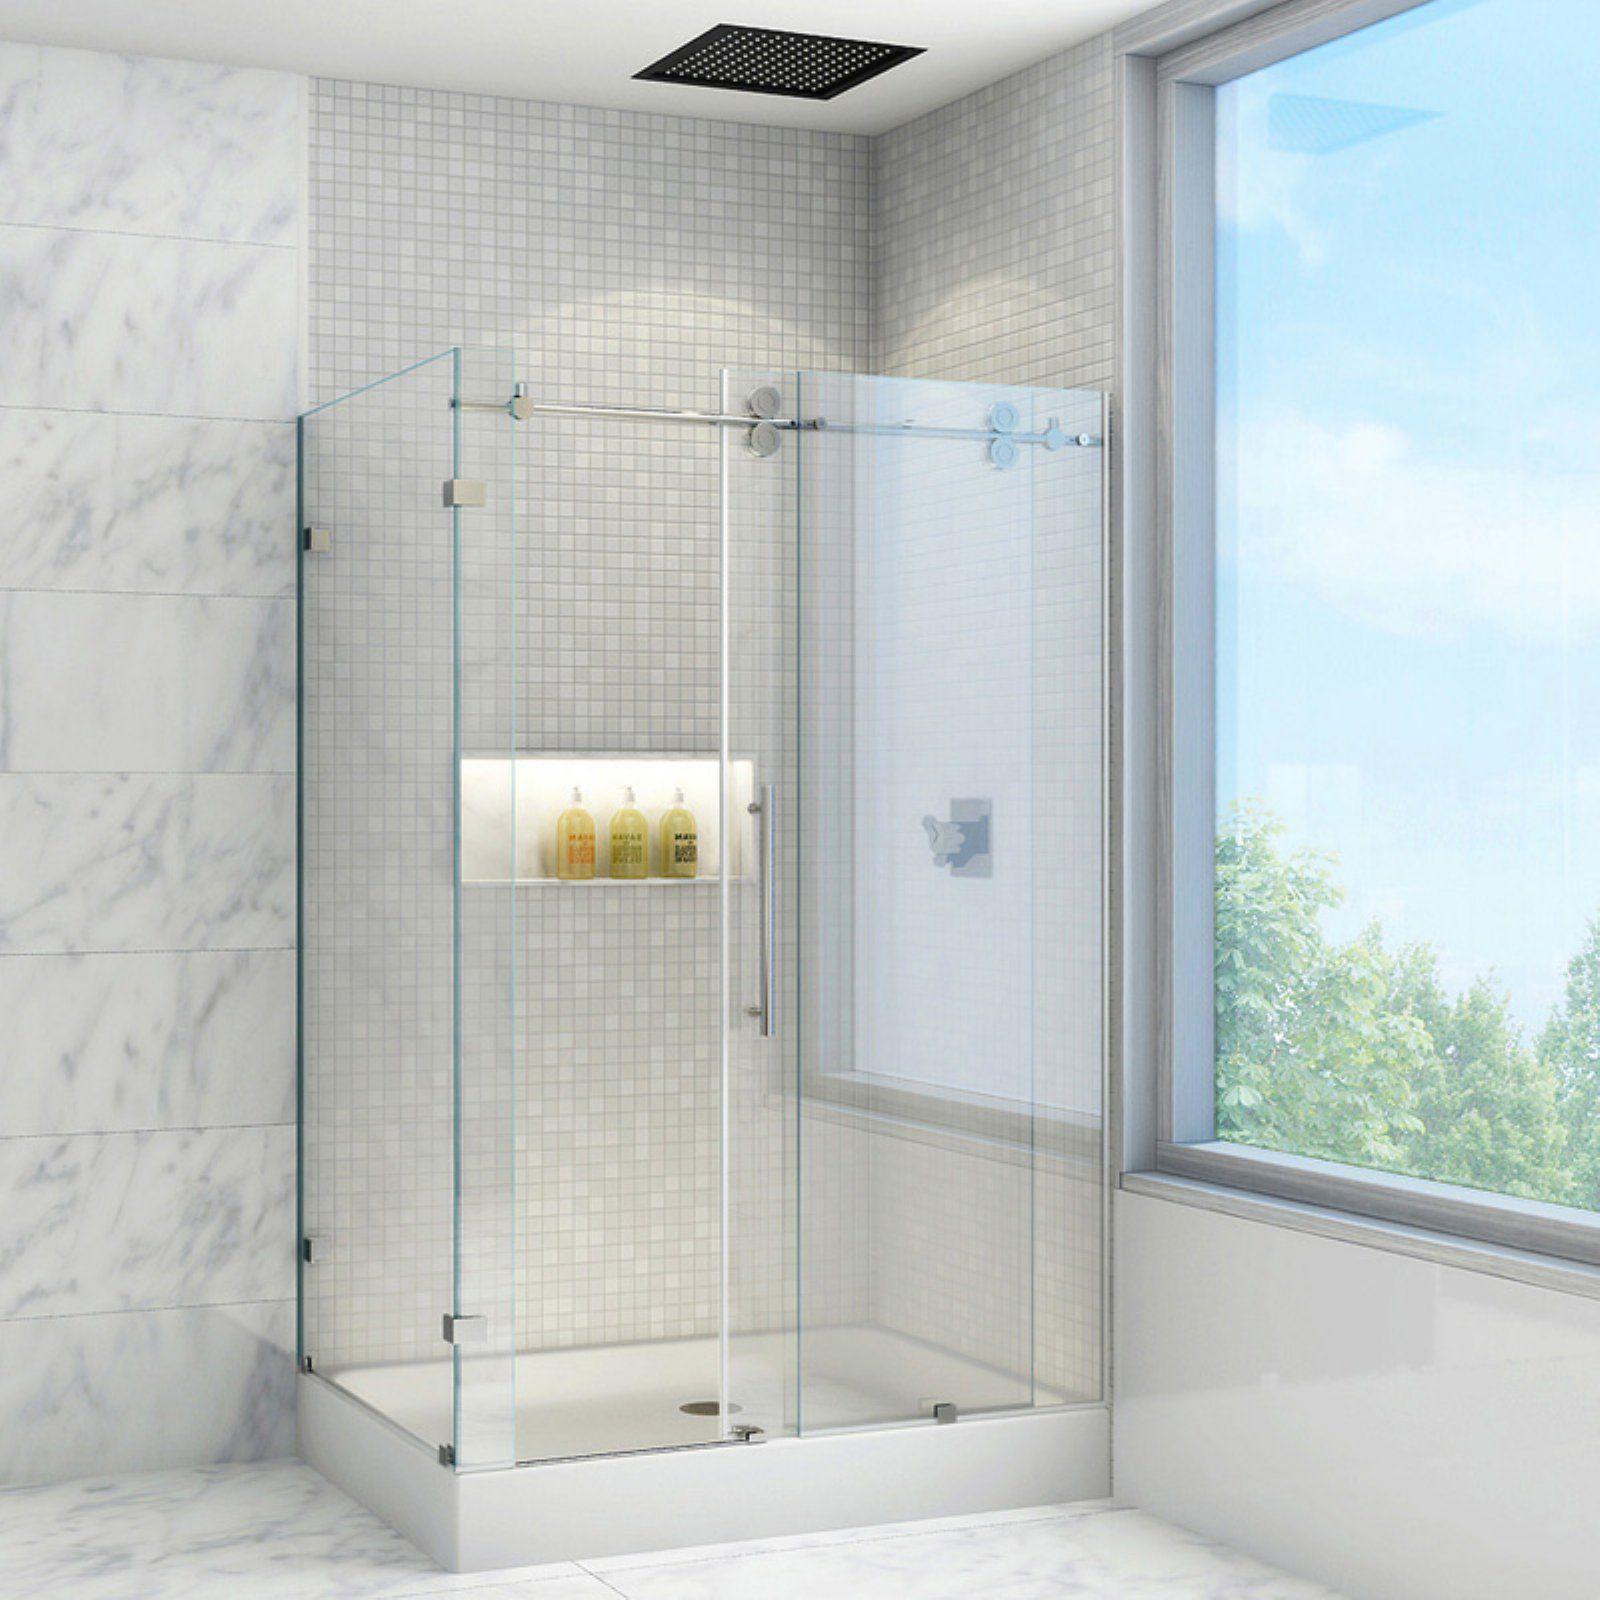 Vigo Vg605148w 38 125w X 79 875h In Clear Glass Shower Enclosure